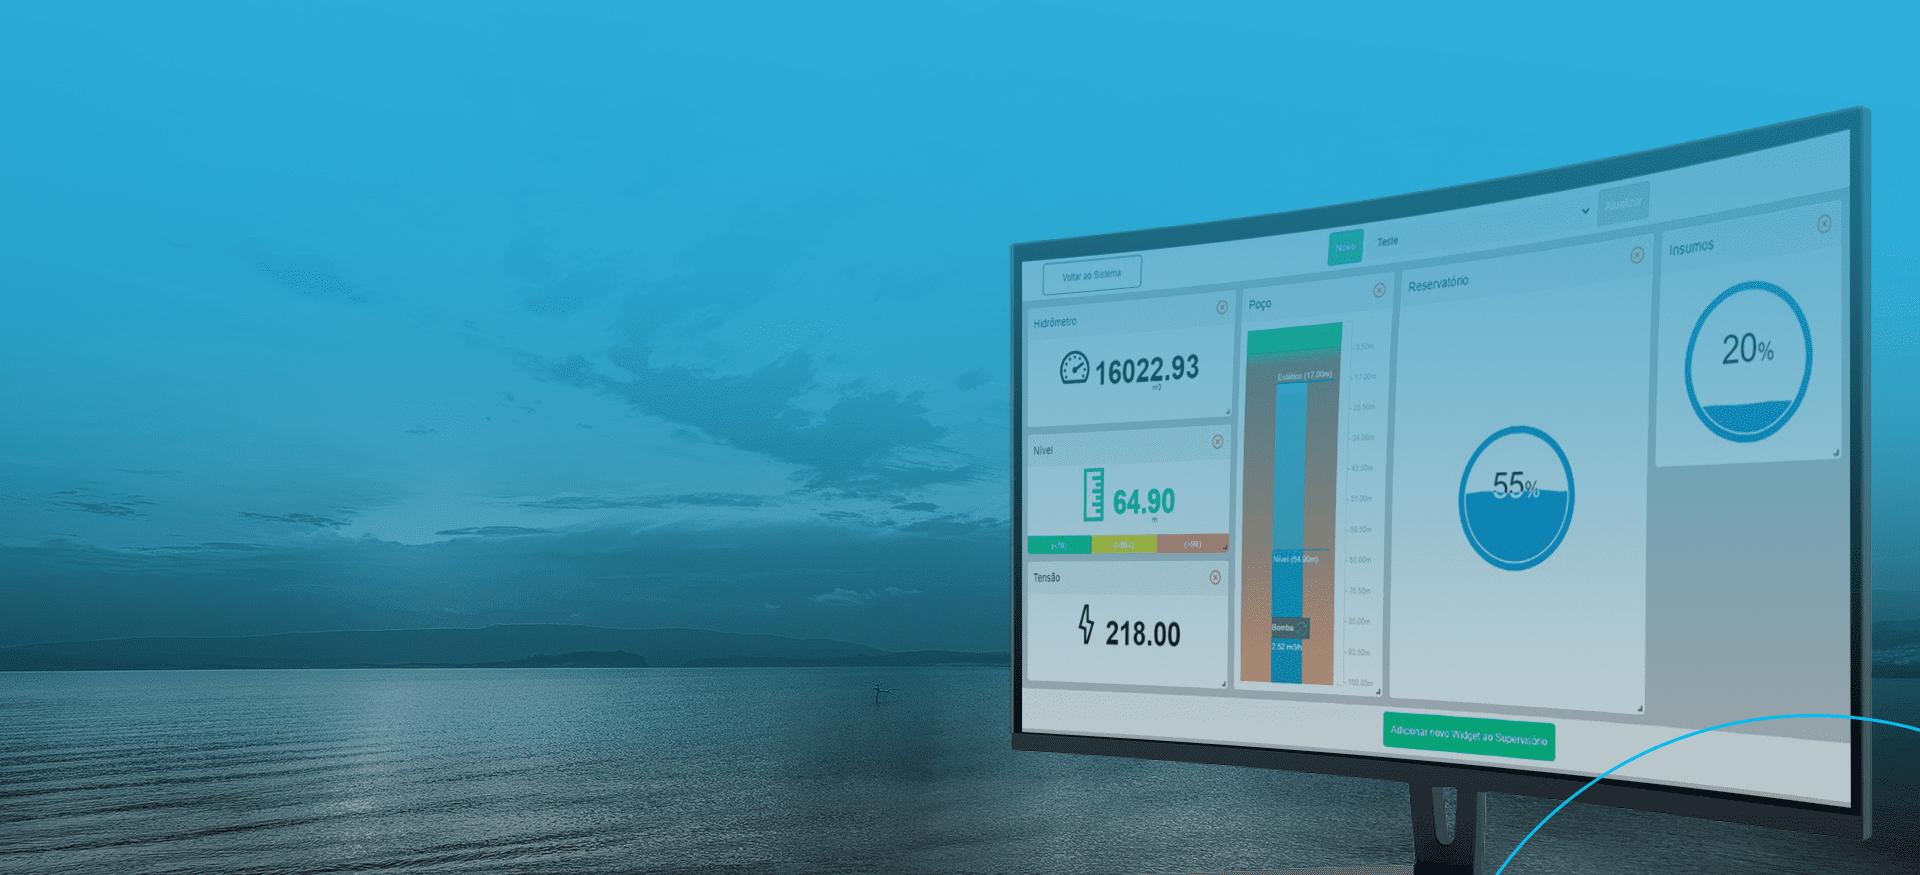 G Hidro - Monitoramento de Água, Monitoramento de Energia